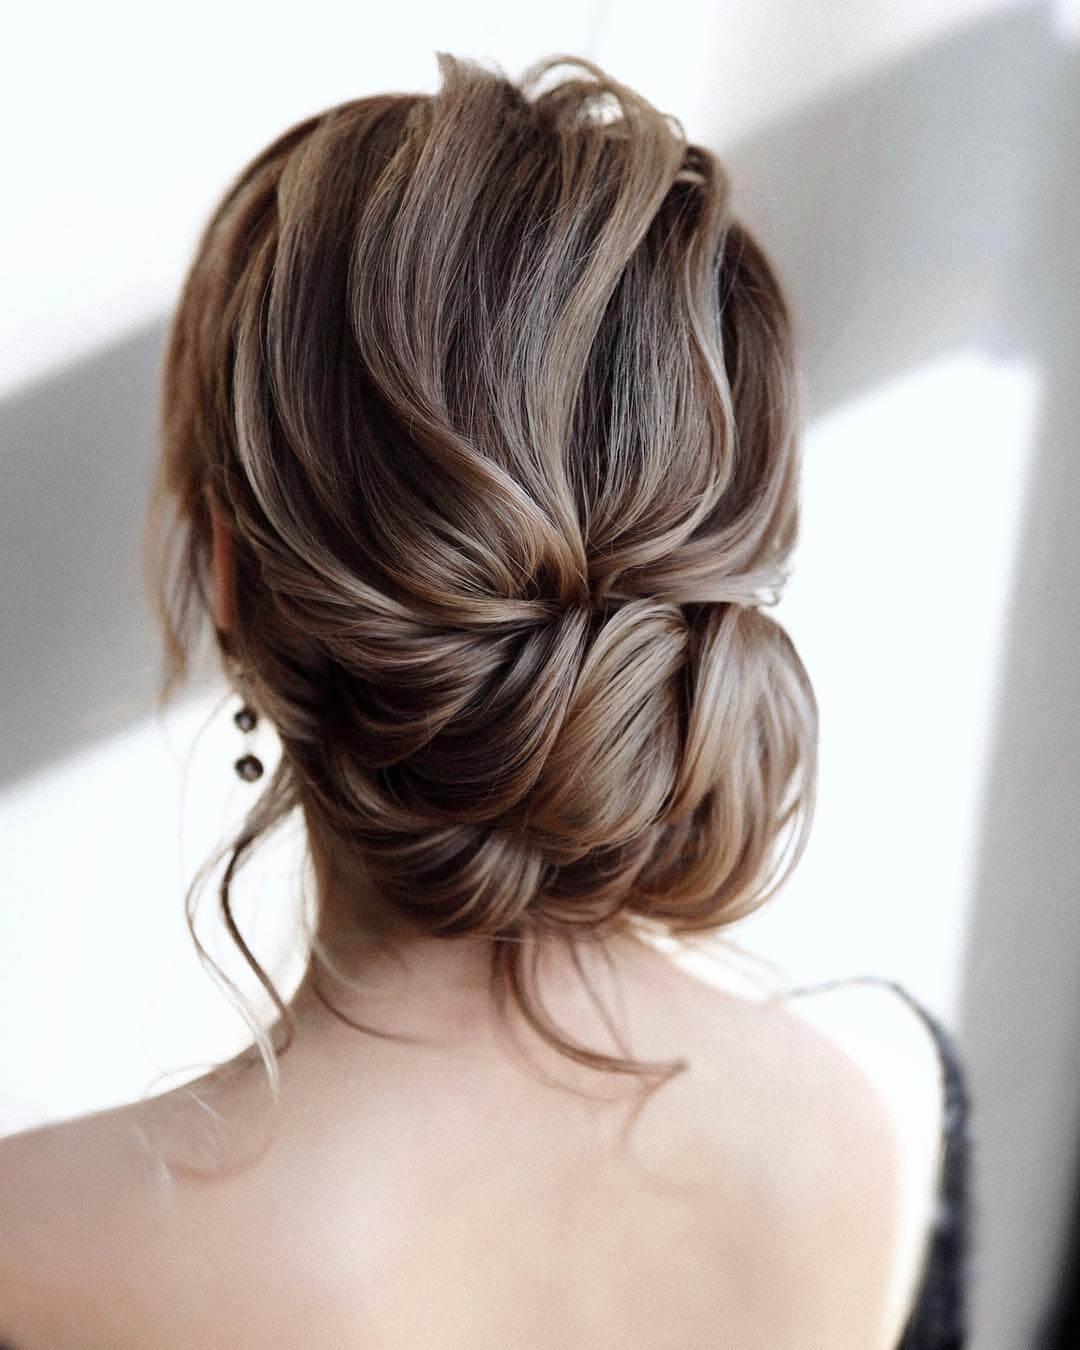 Step by Step Twist layer lower bun Hairstyles for Long, Medium, Short Hair